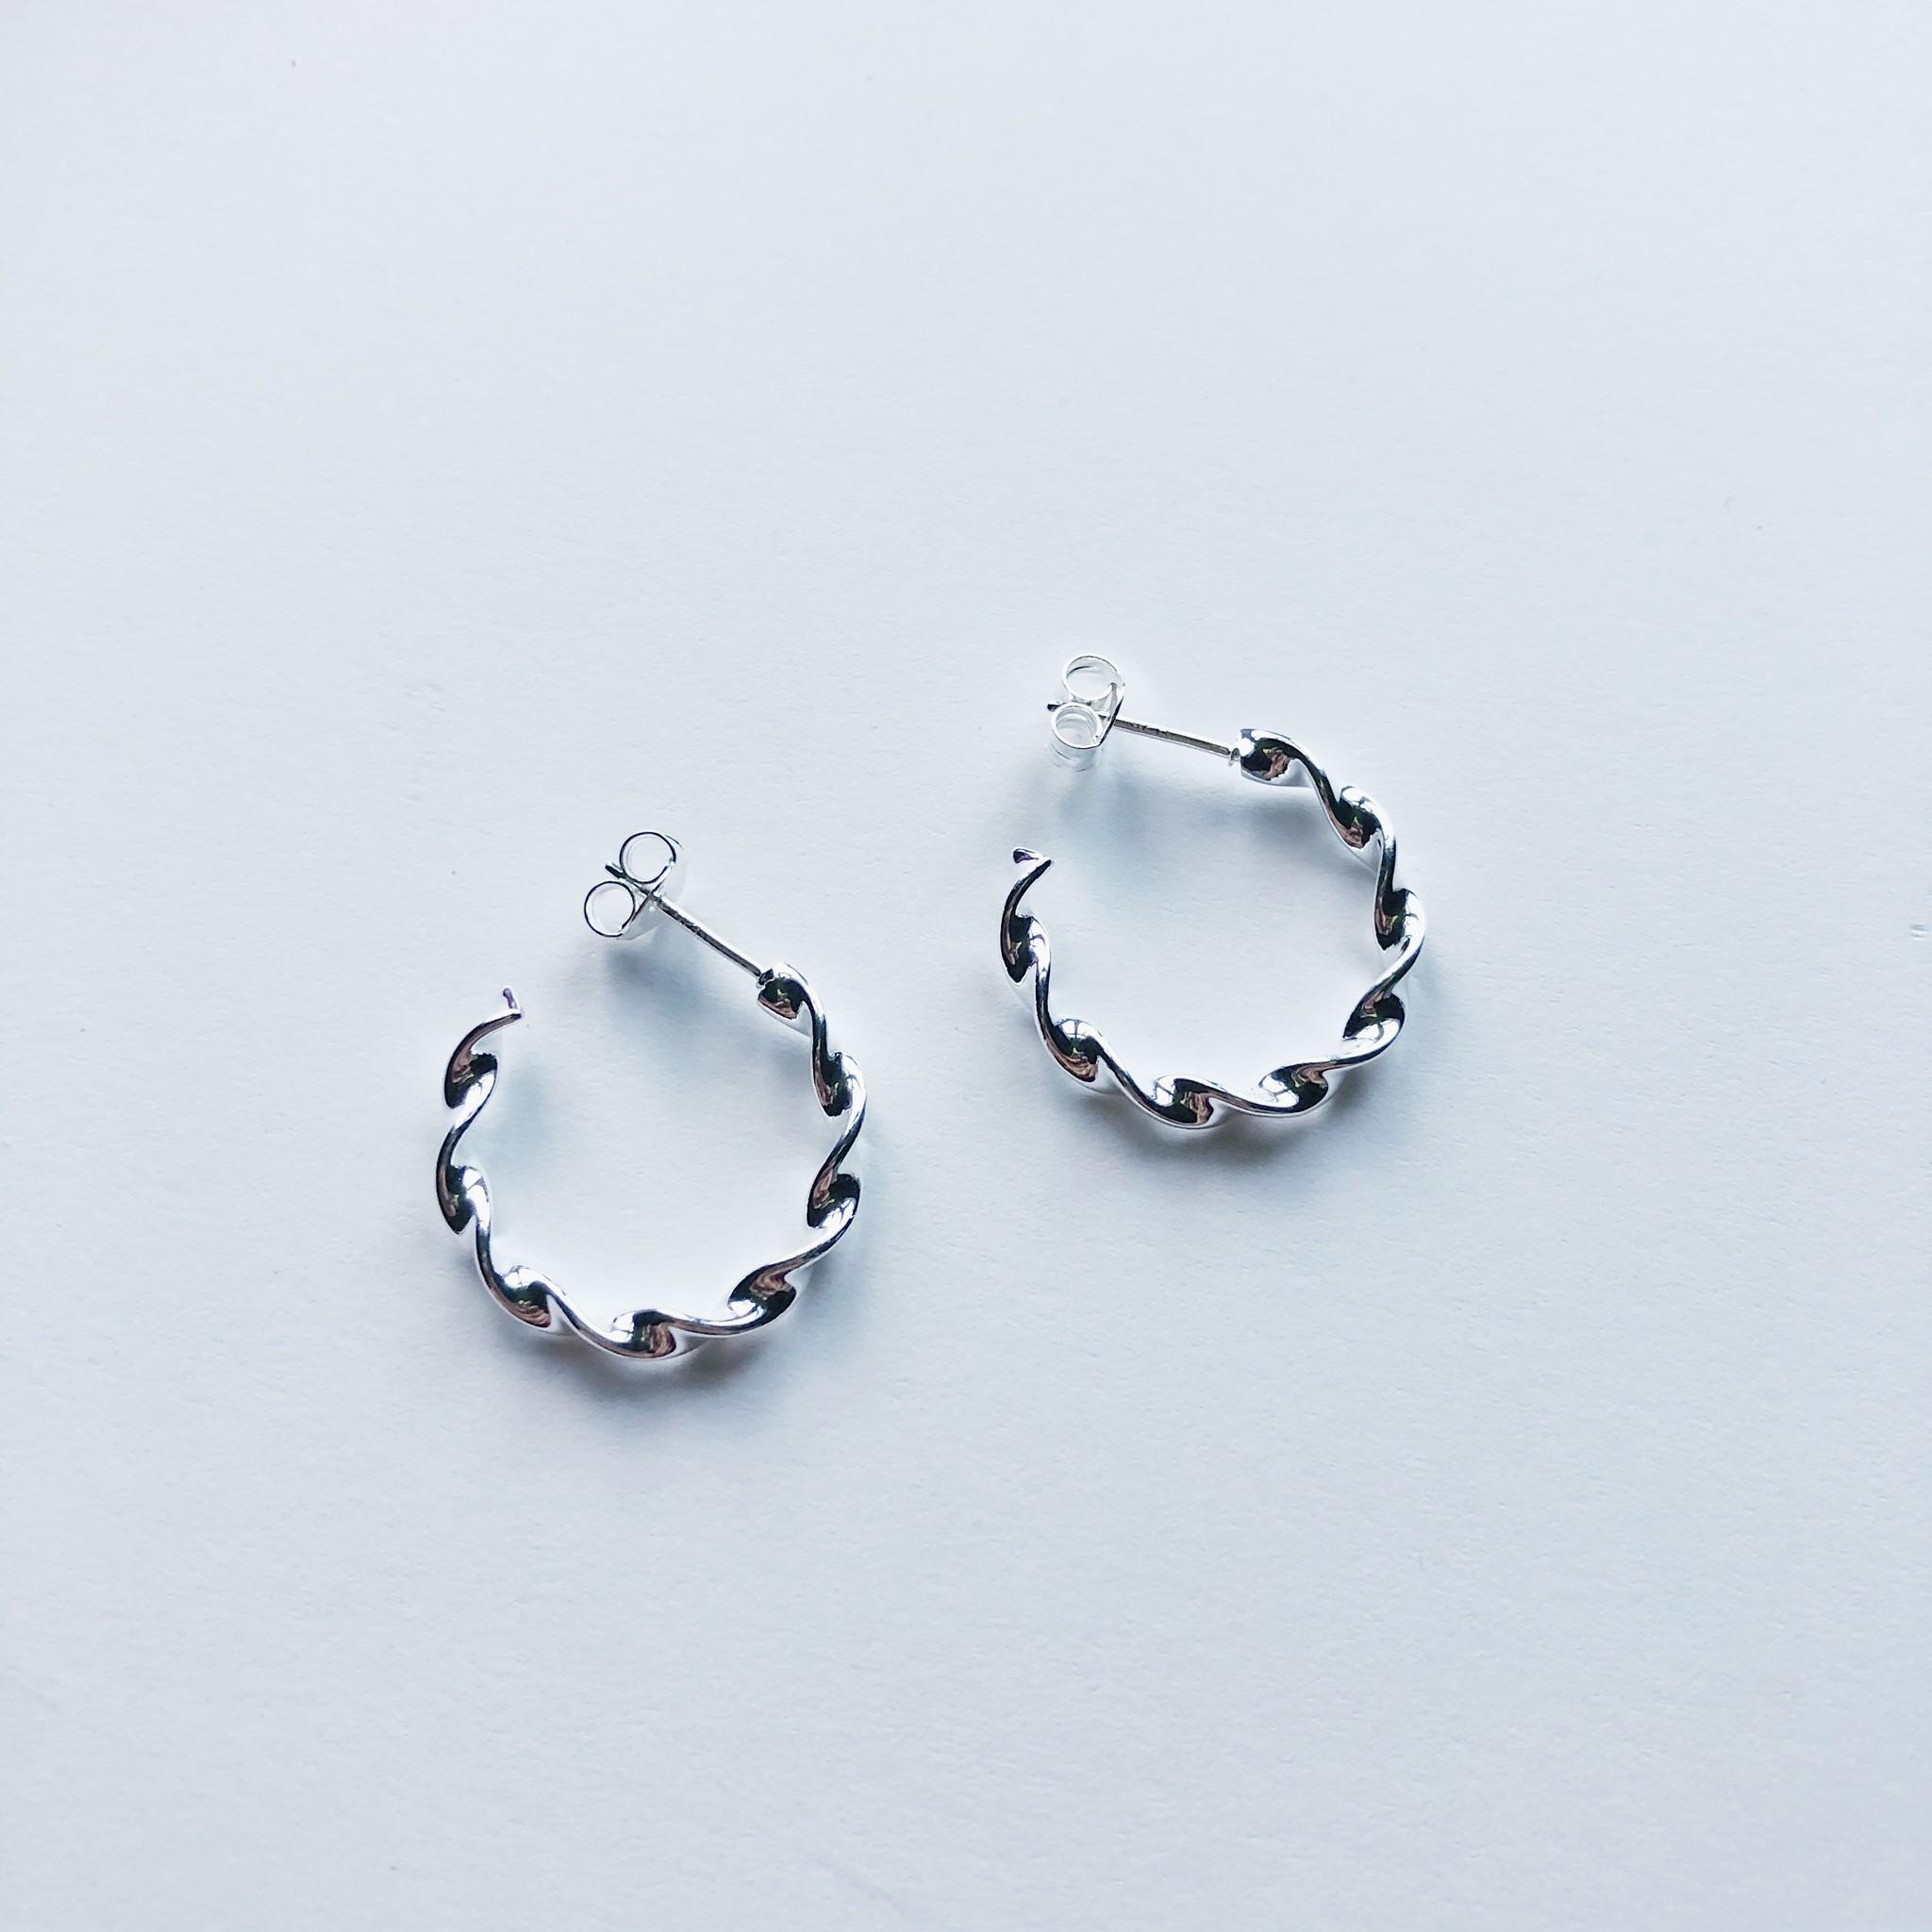 Tashi Small Silver Swirl Hoops on Post